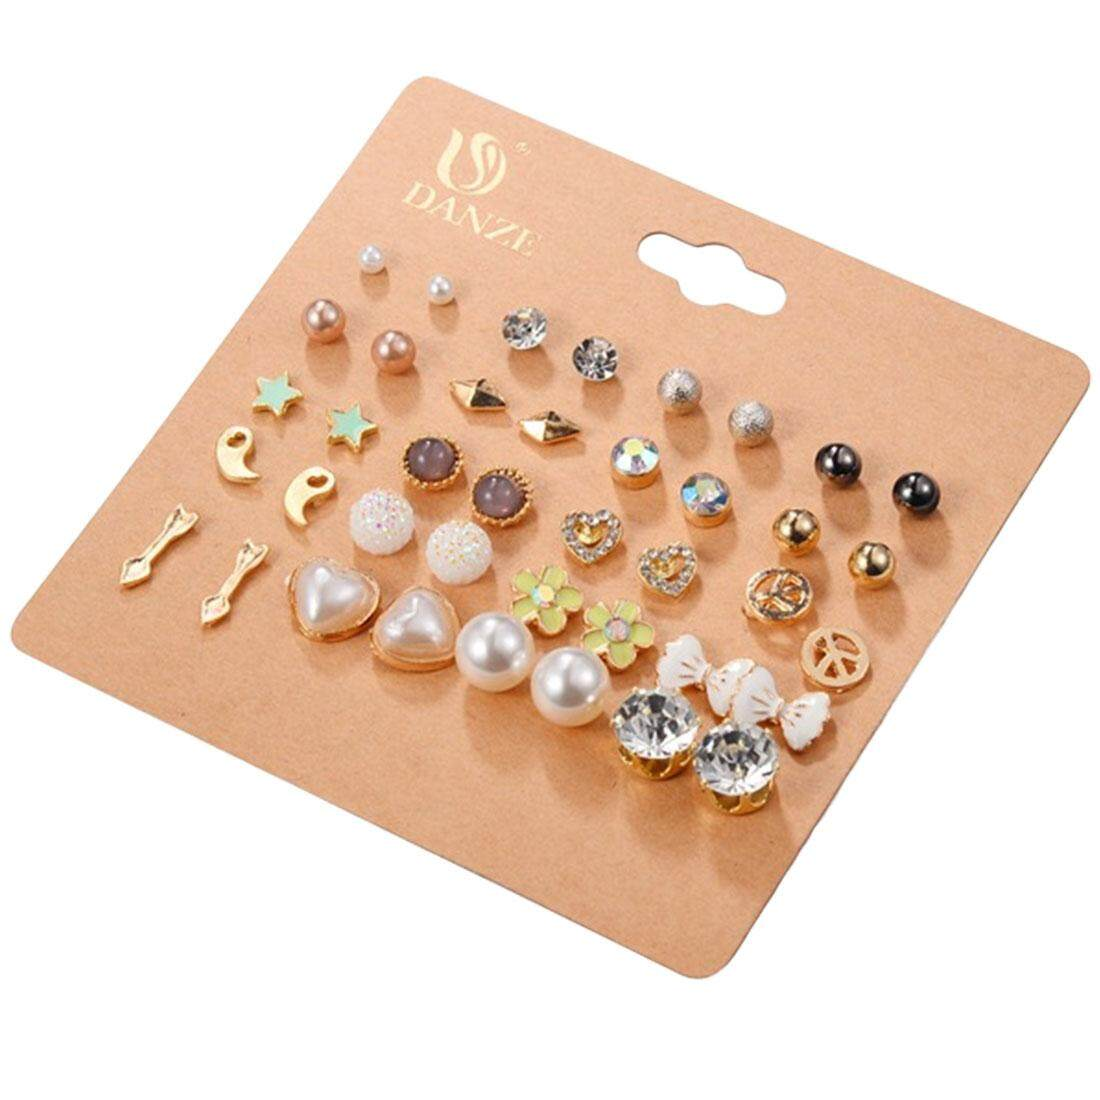 Set Anting-anting Campuran Wanita Perhiasan Wanita Hadiah Aksesoris